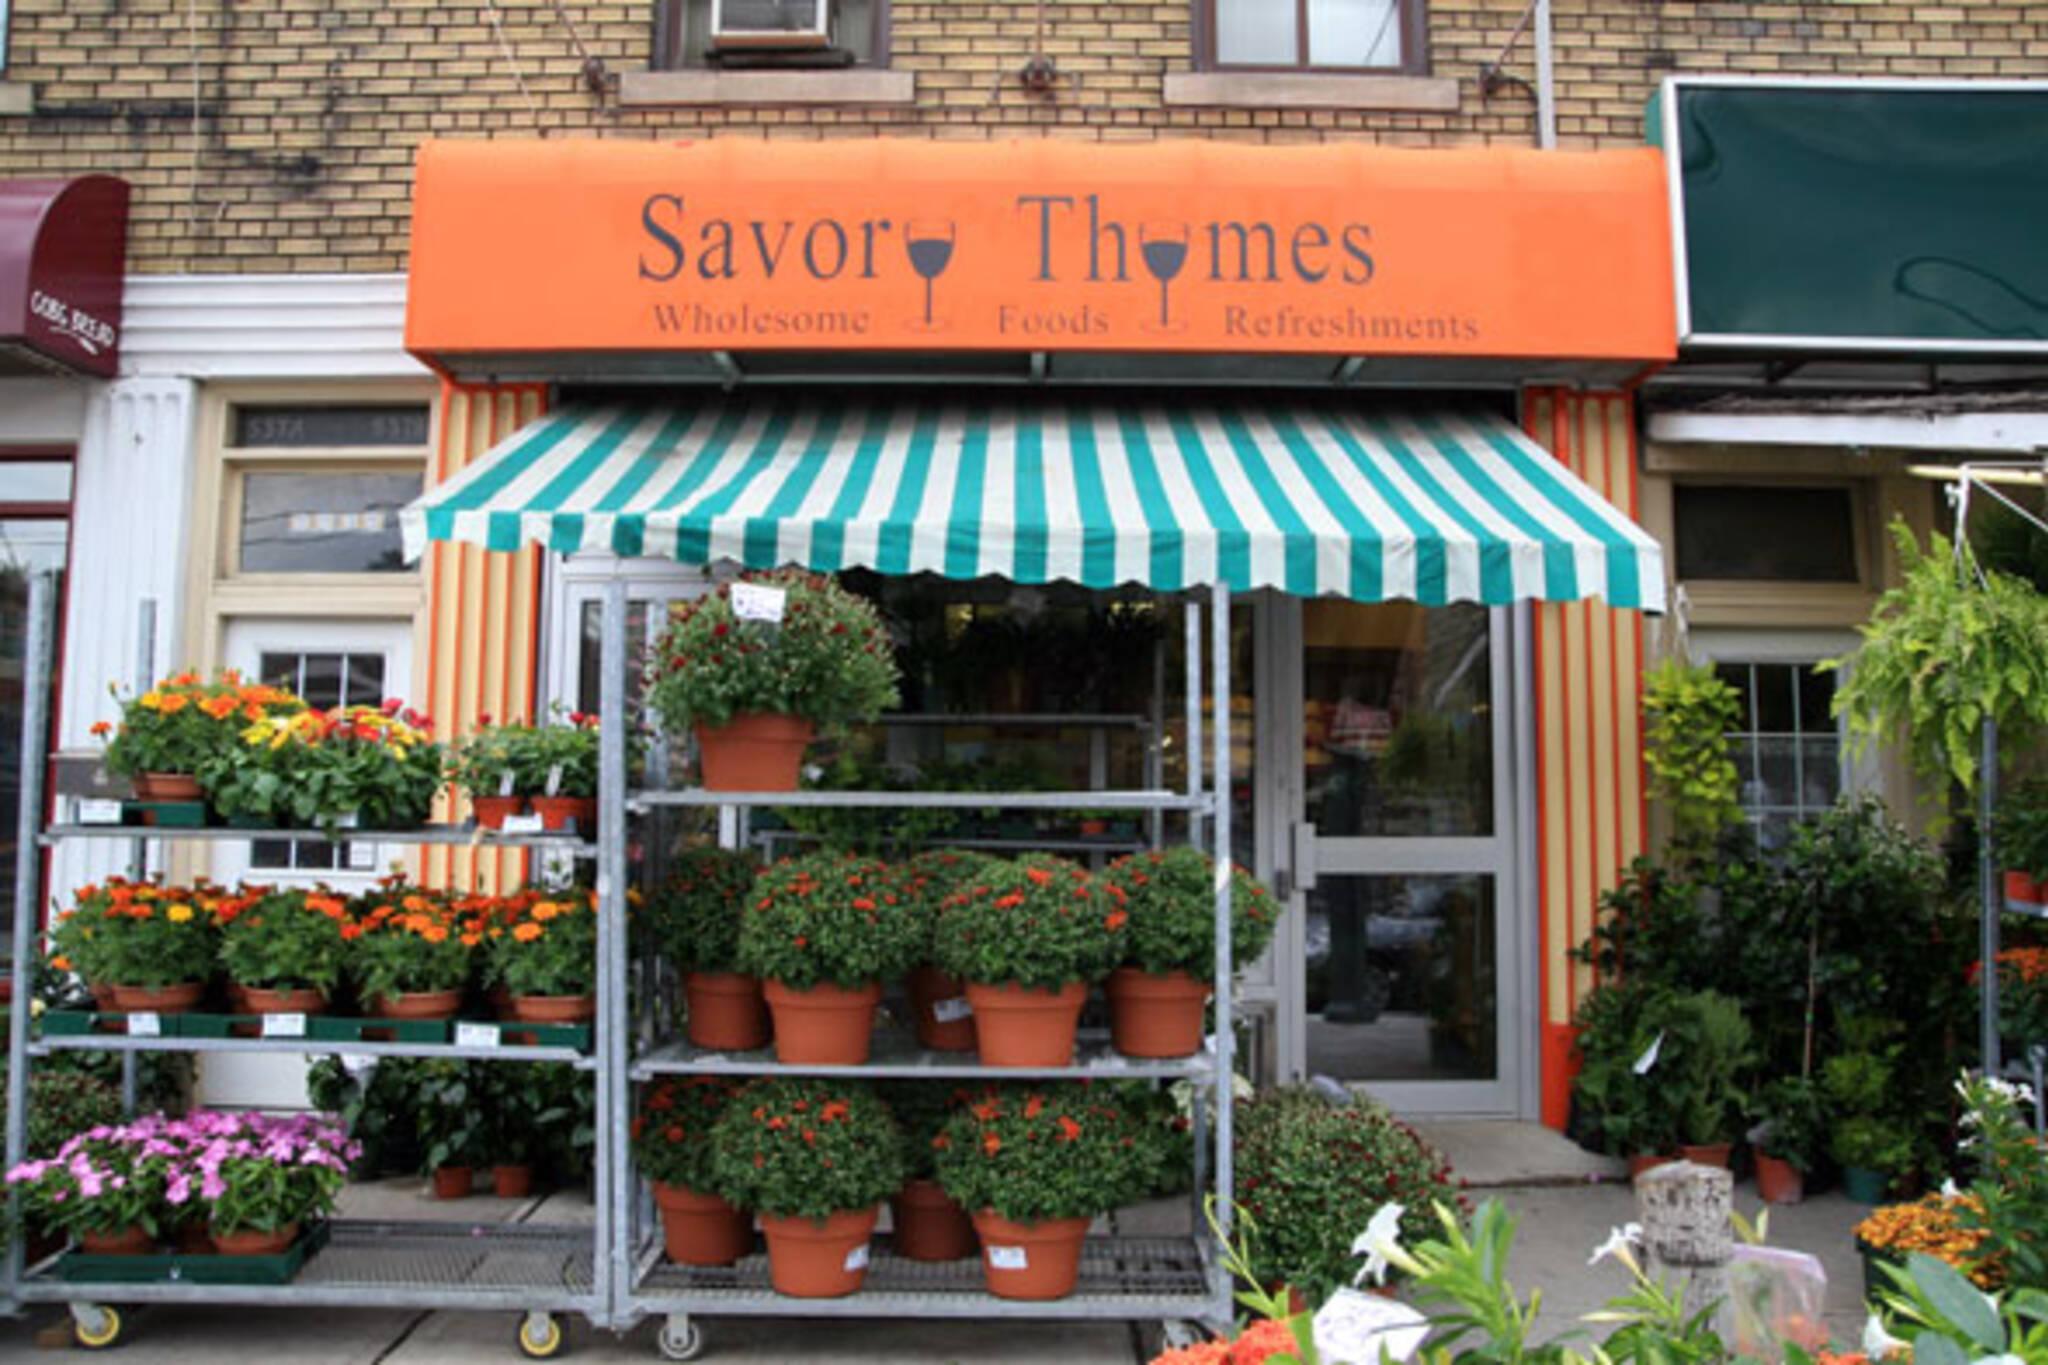 Savory Thymes Toronto